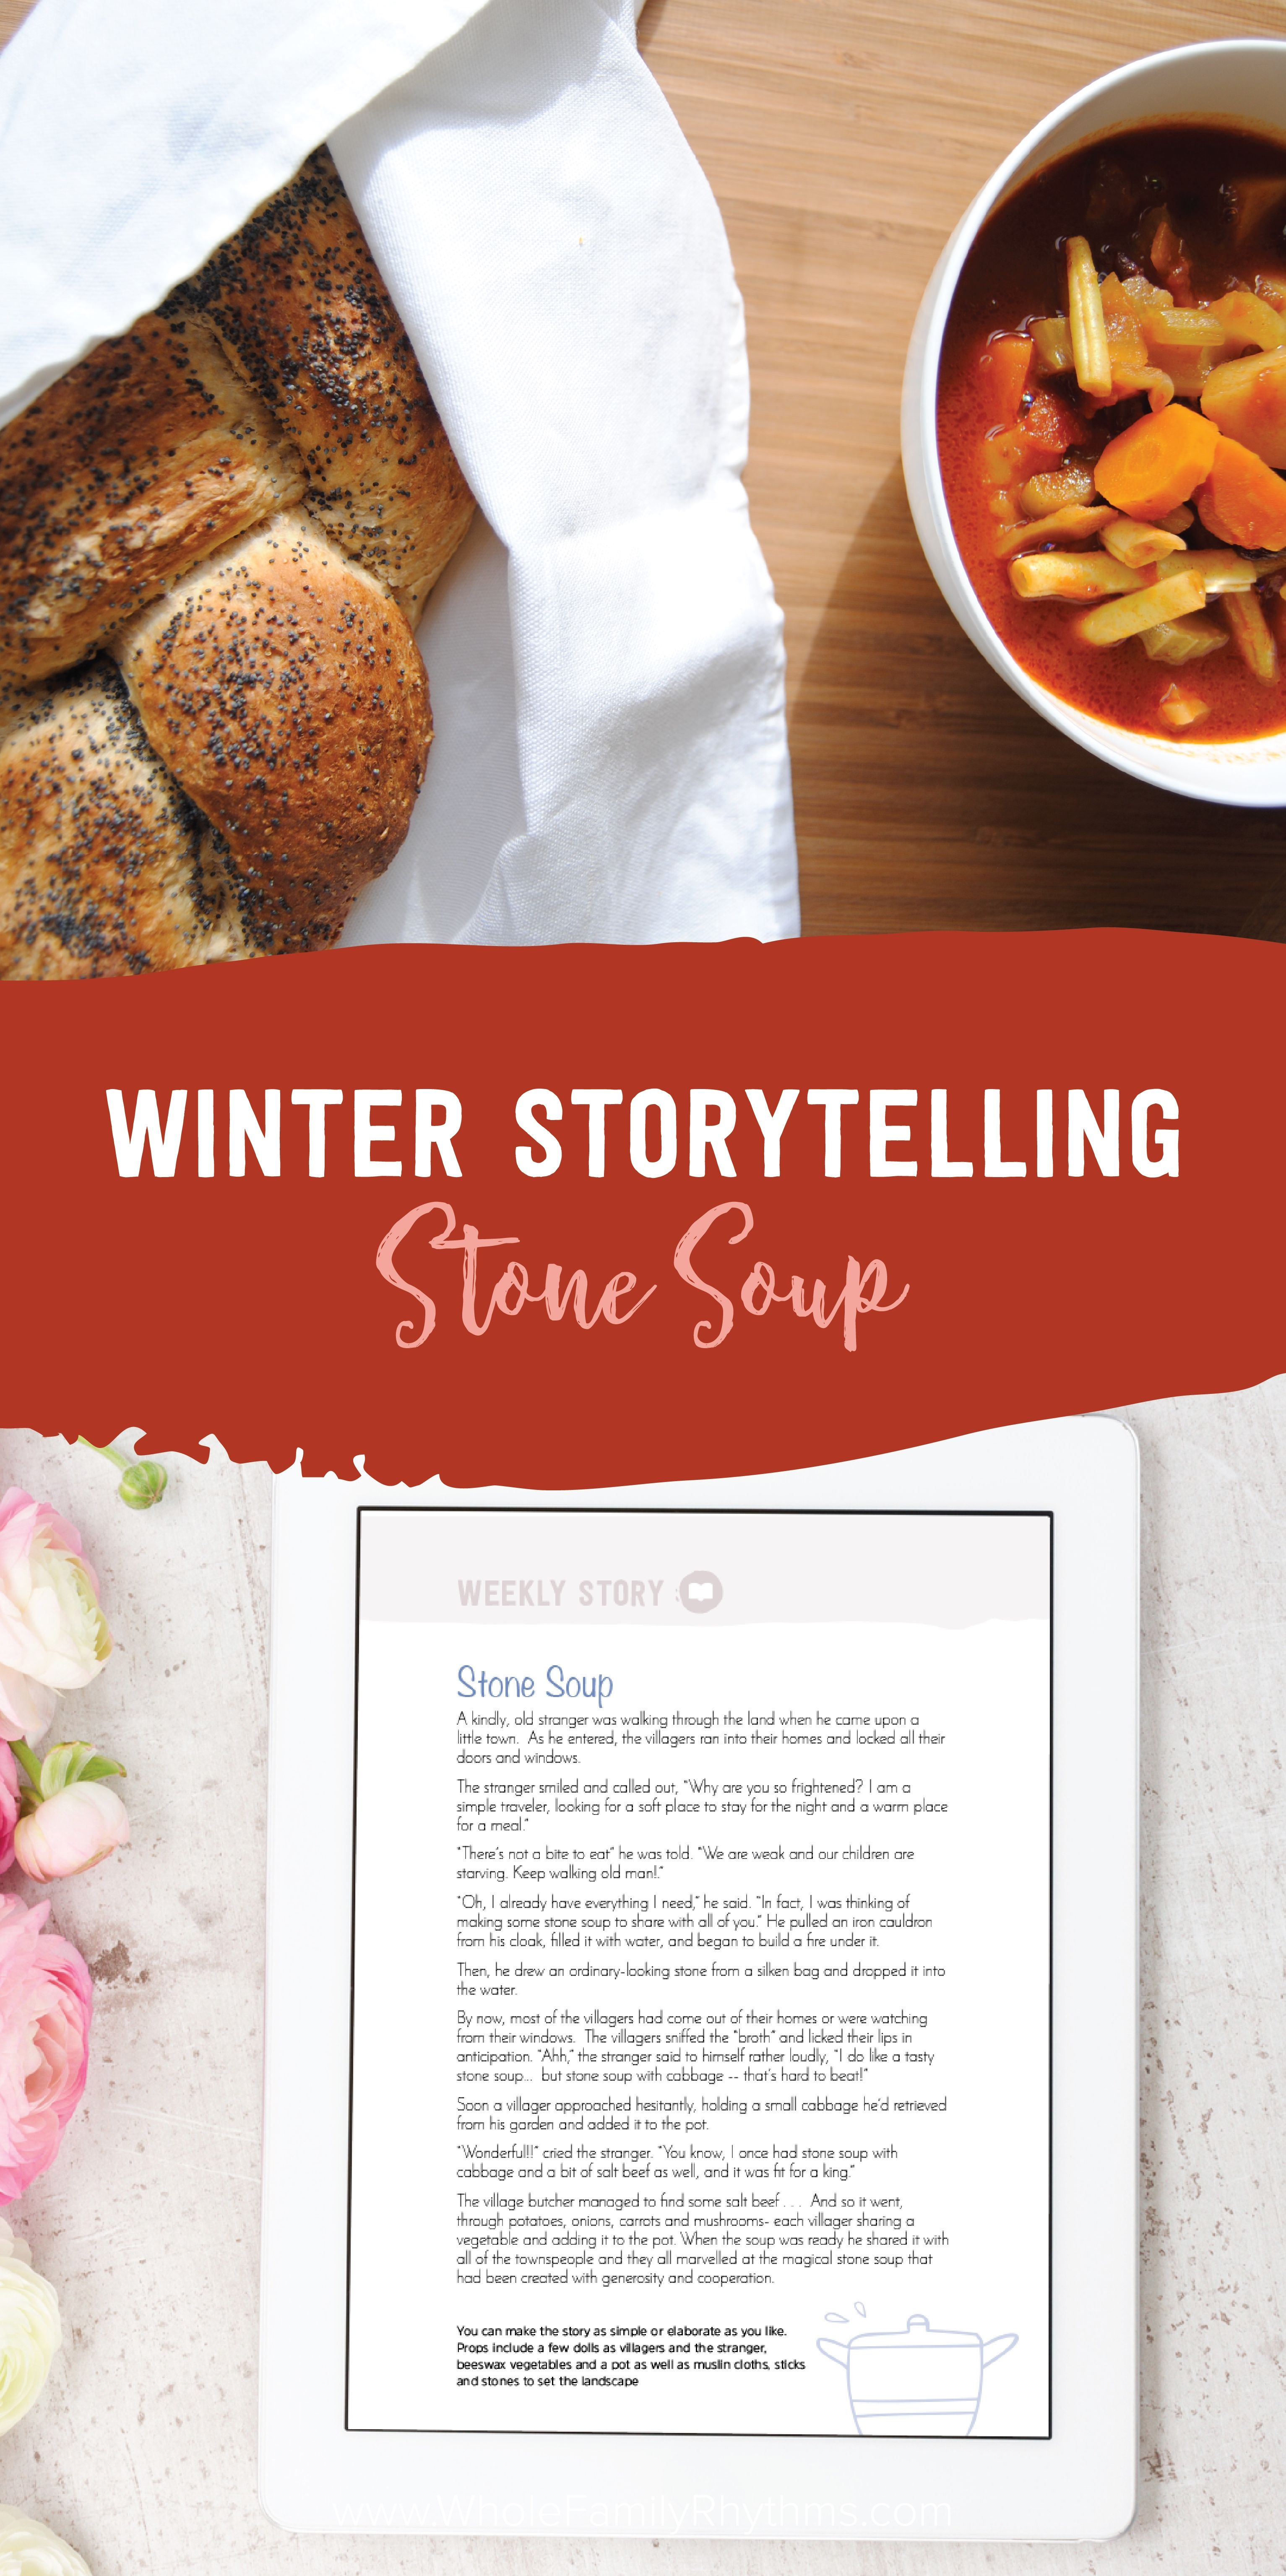 Winter Storytelling Stone Soup